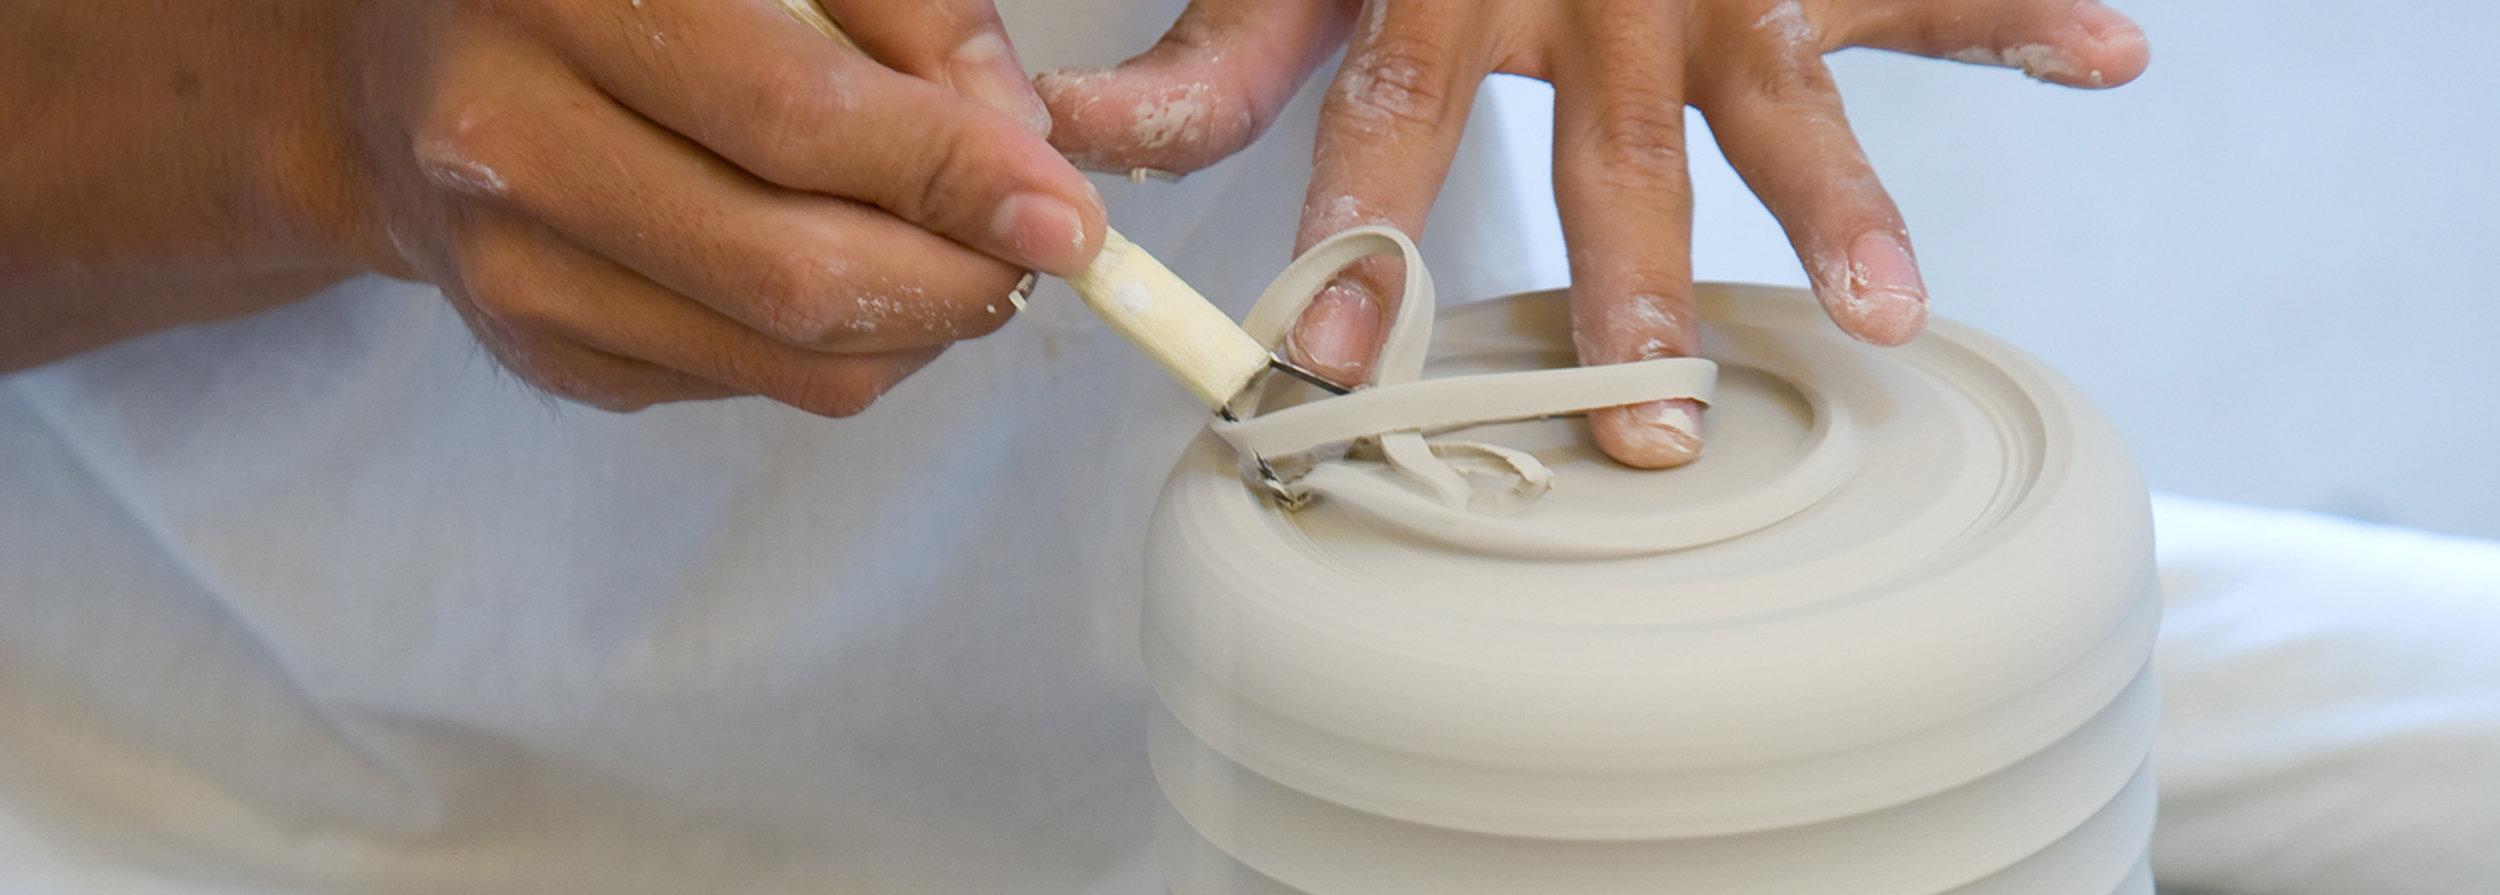 trim the vase.jpg